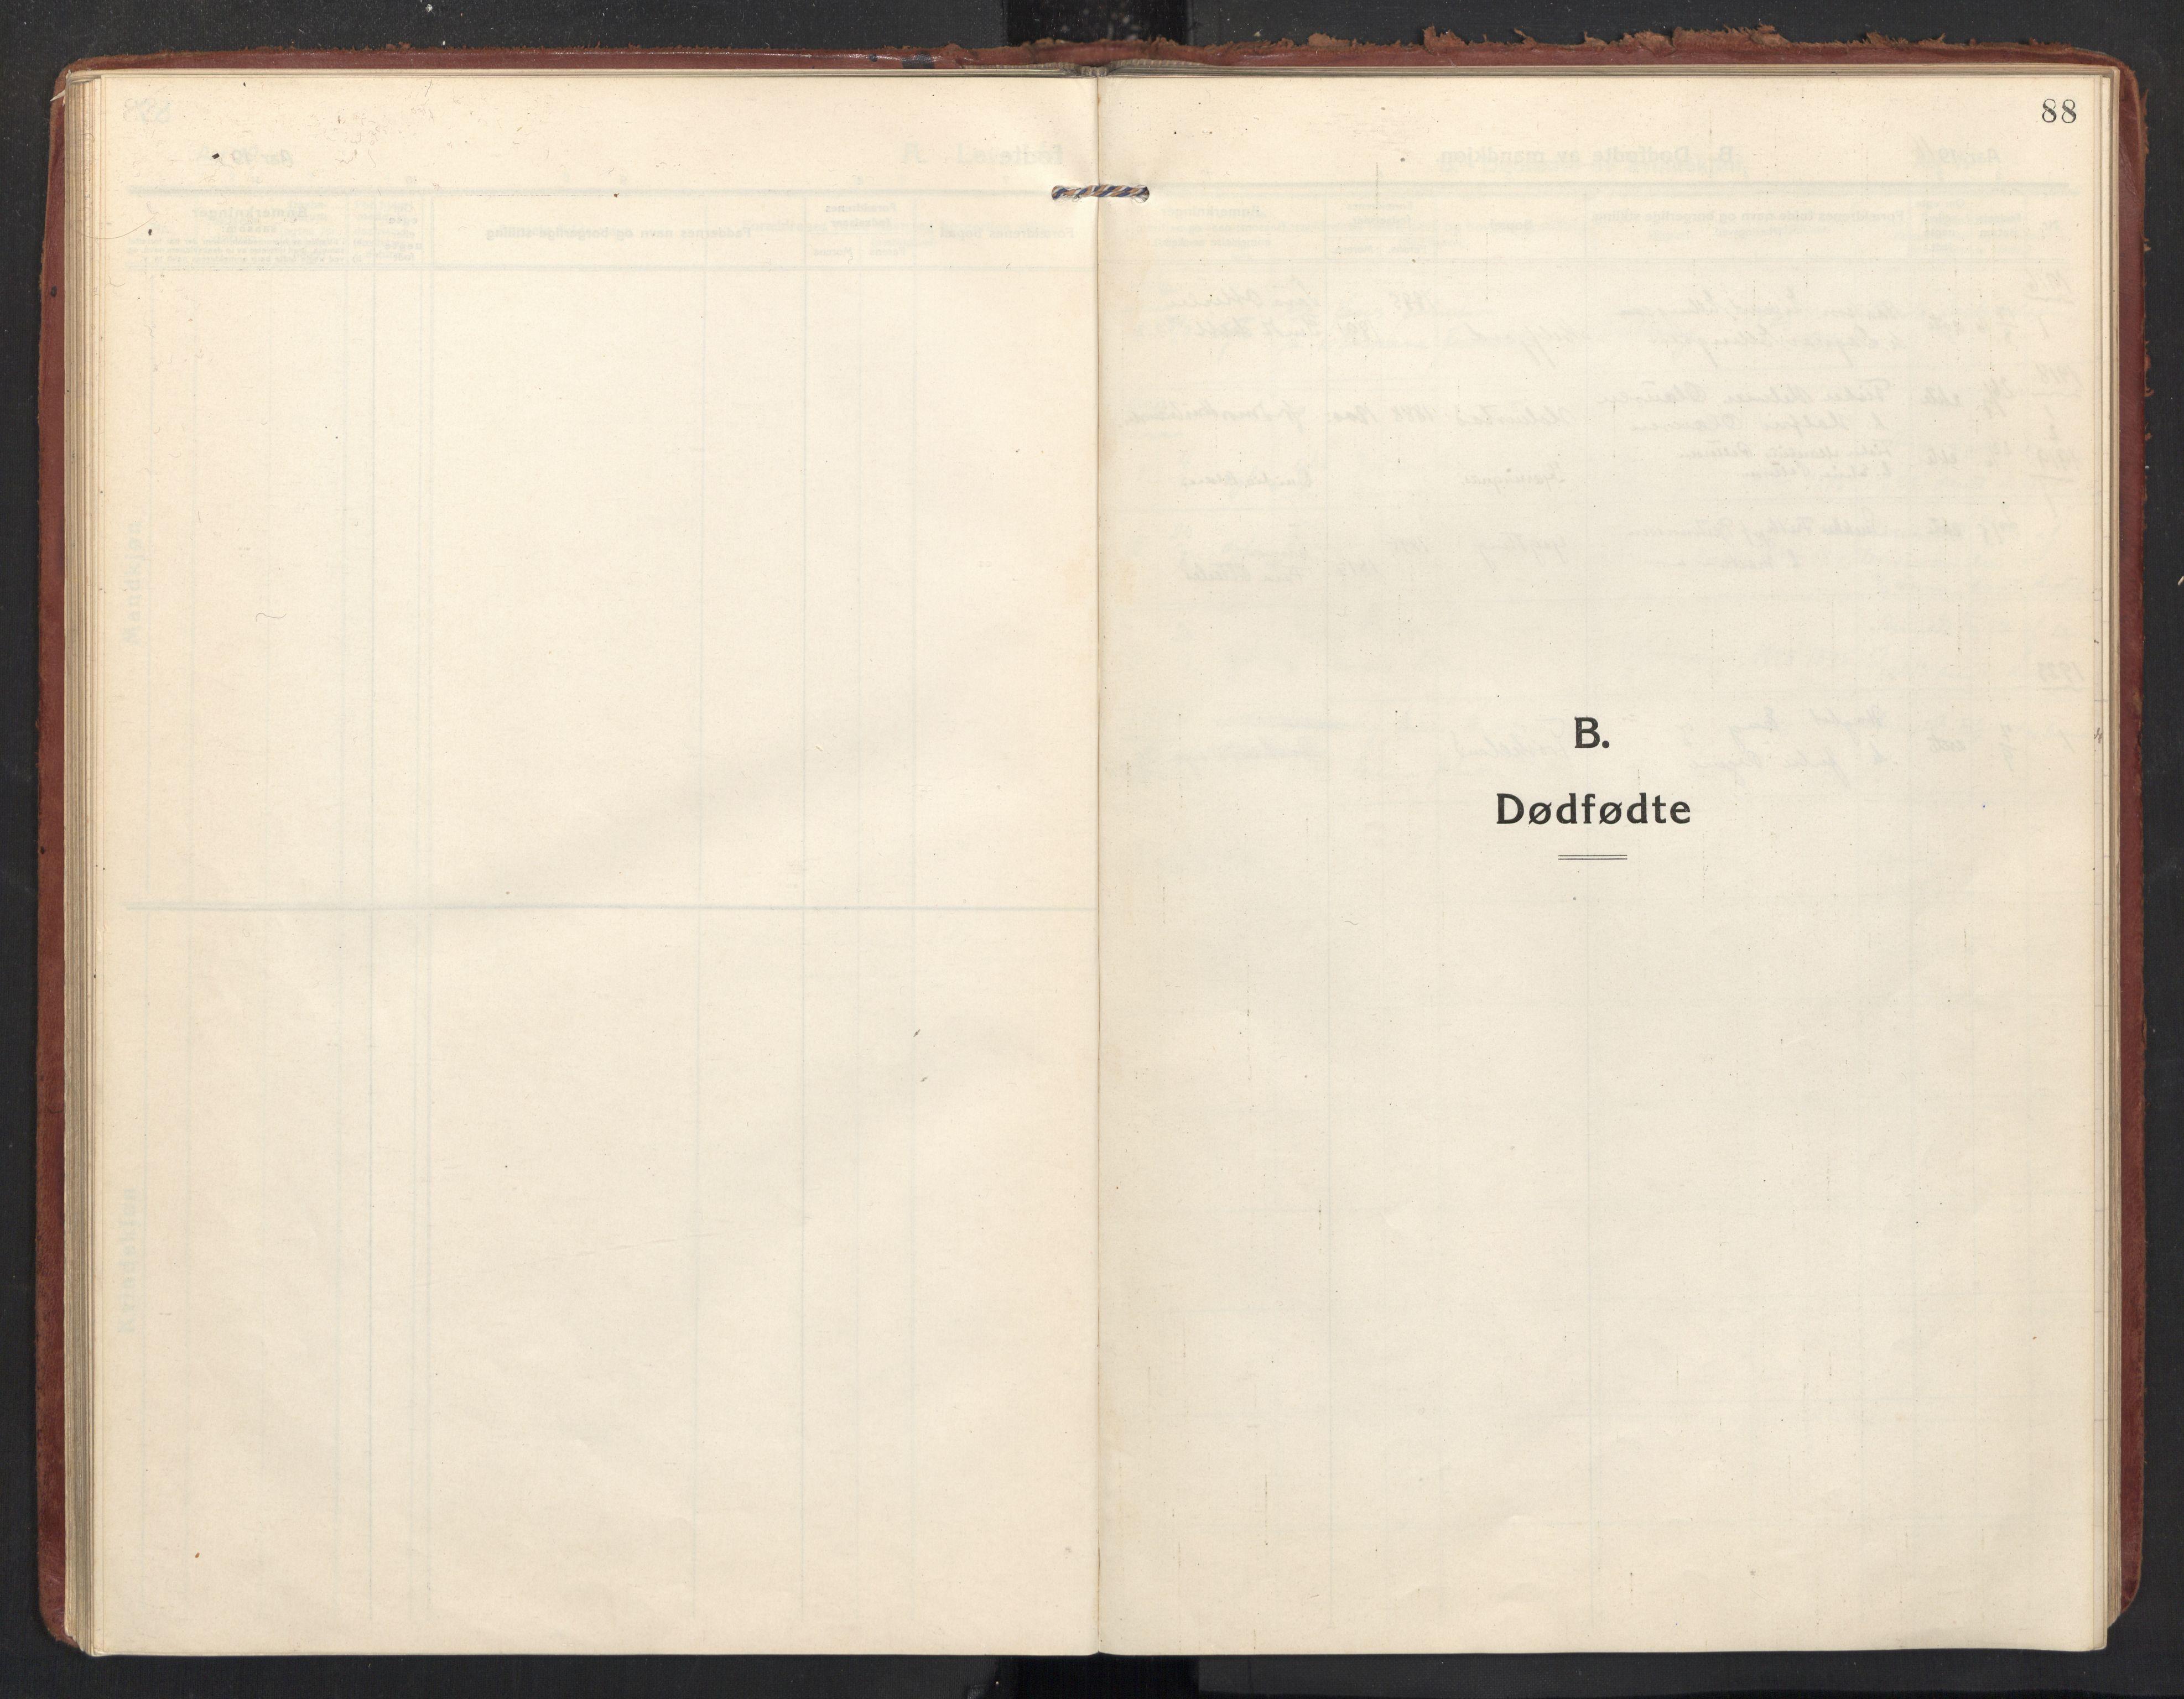 SAT, Ministerialprotokoller, klokkerbøker og fødselsregistre - Nordland, 890/L1288: Ministerialbok nr. 890A03, 1915-1925, s. 88